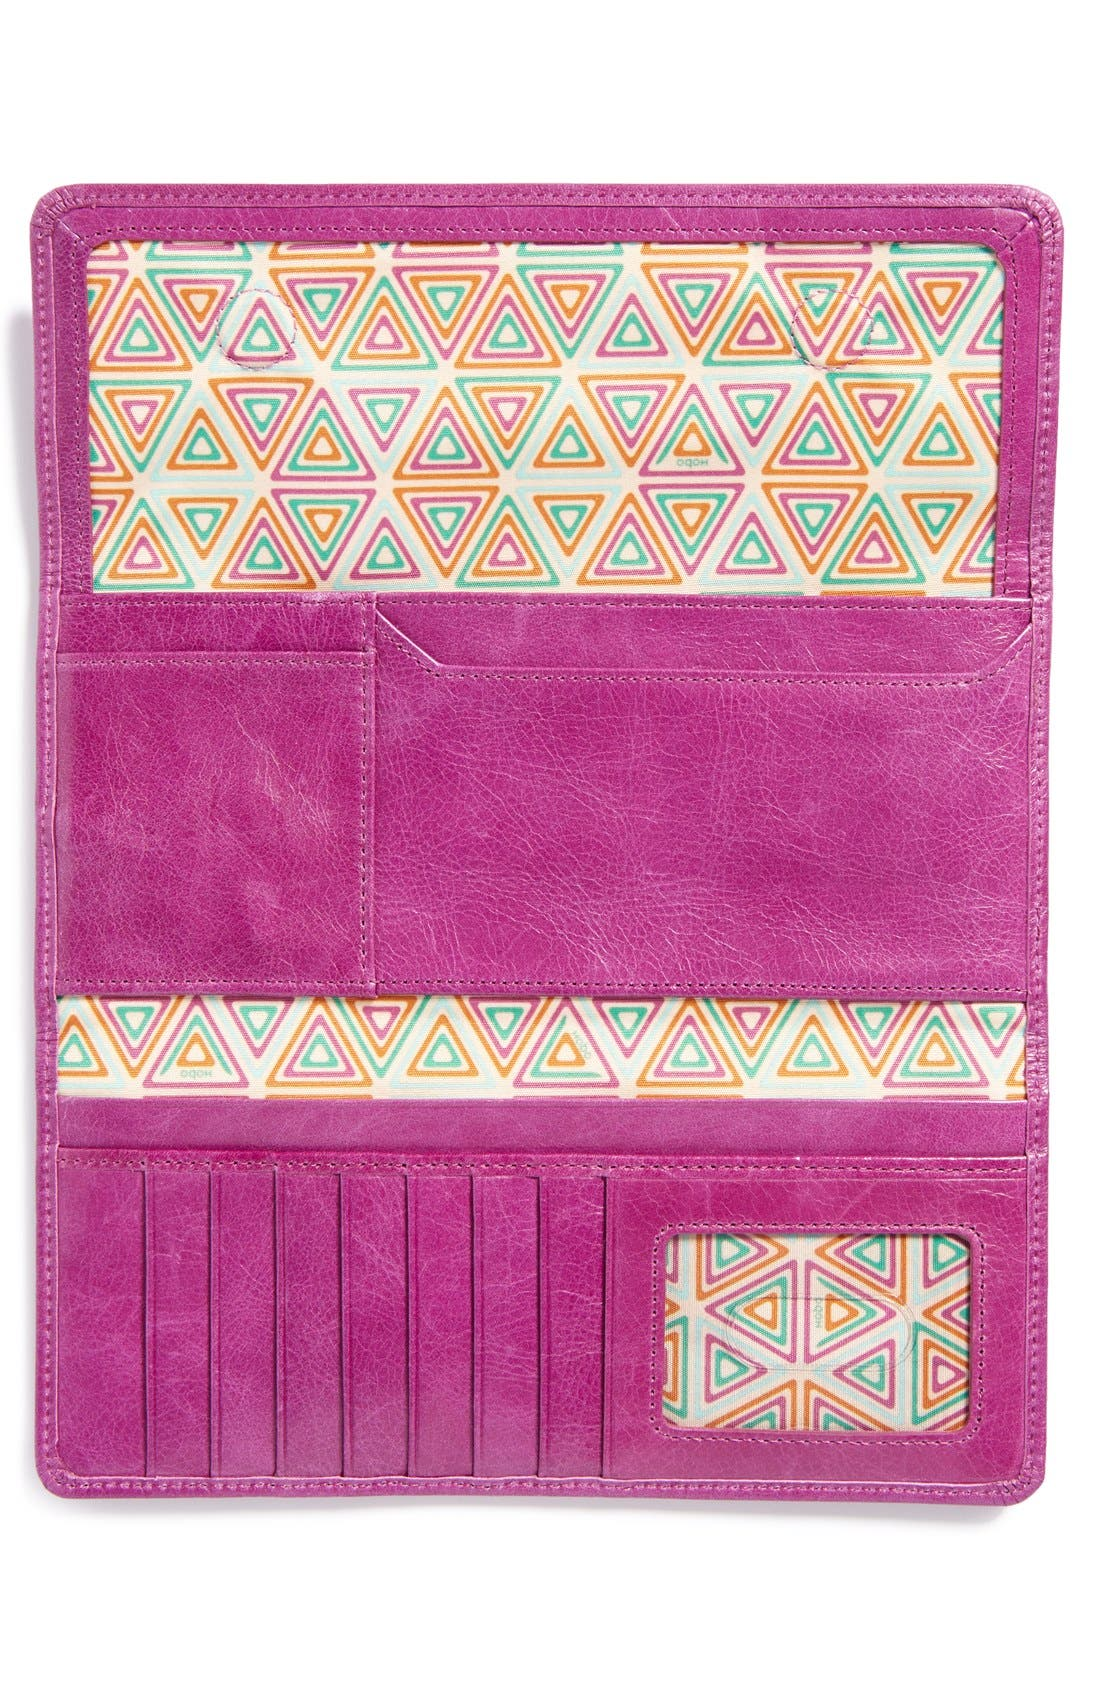 'Sadie' Leather Wallet,                             Alternate thumbnail 200, color,